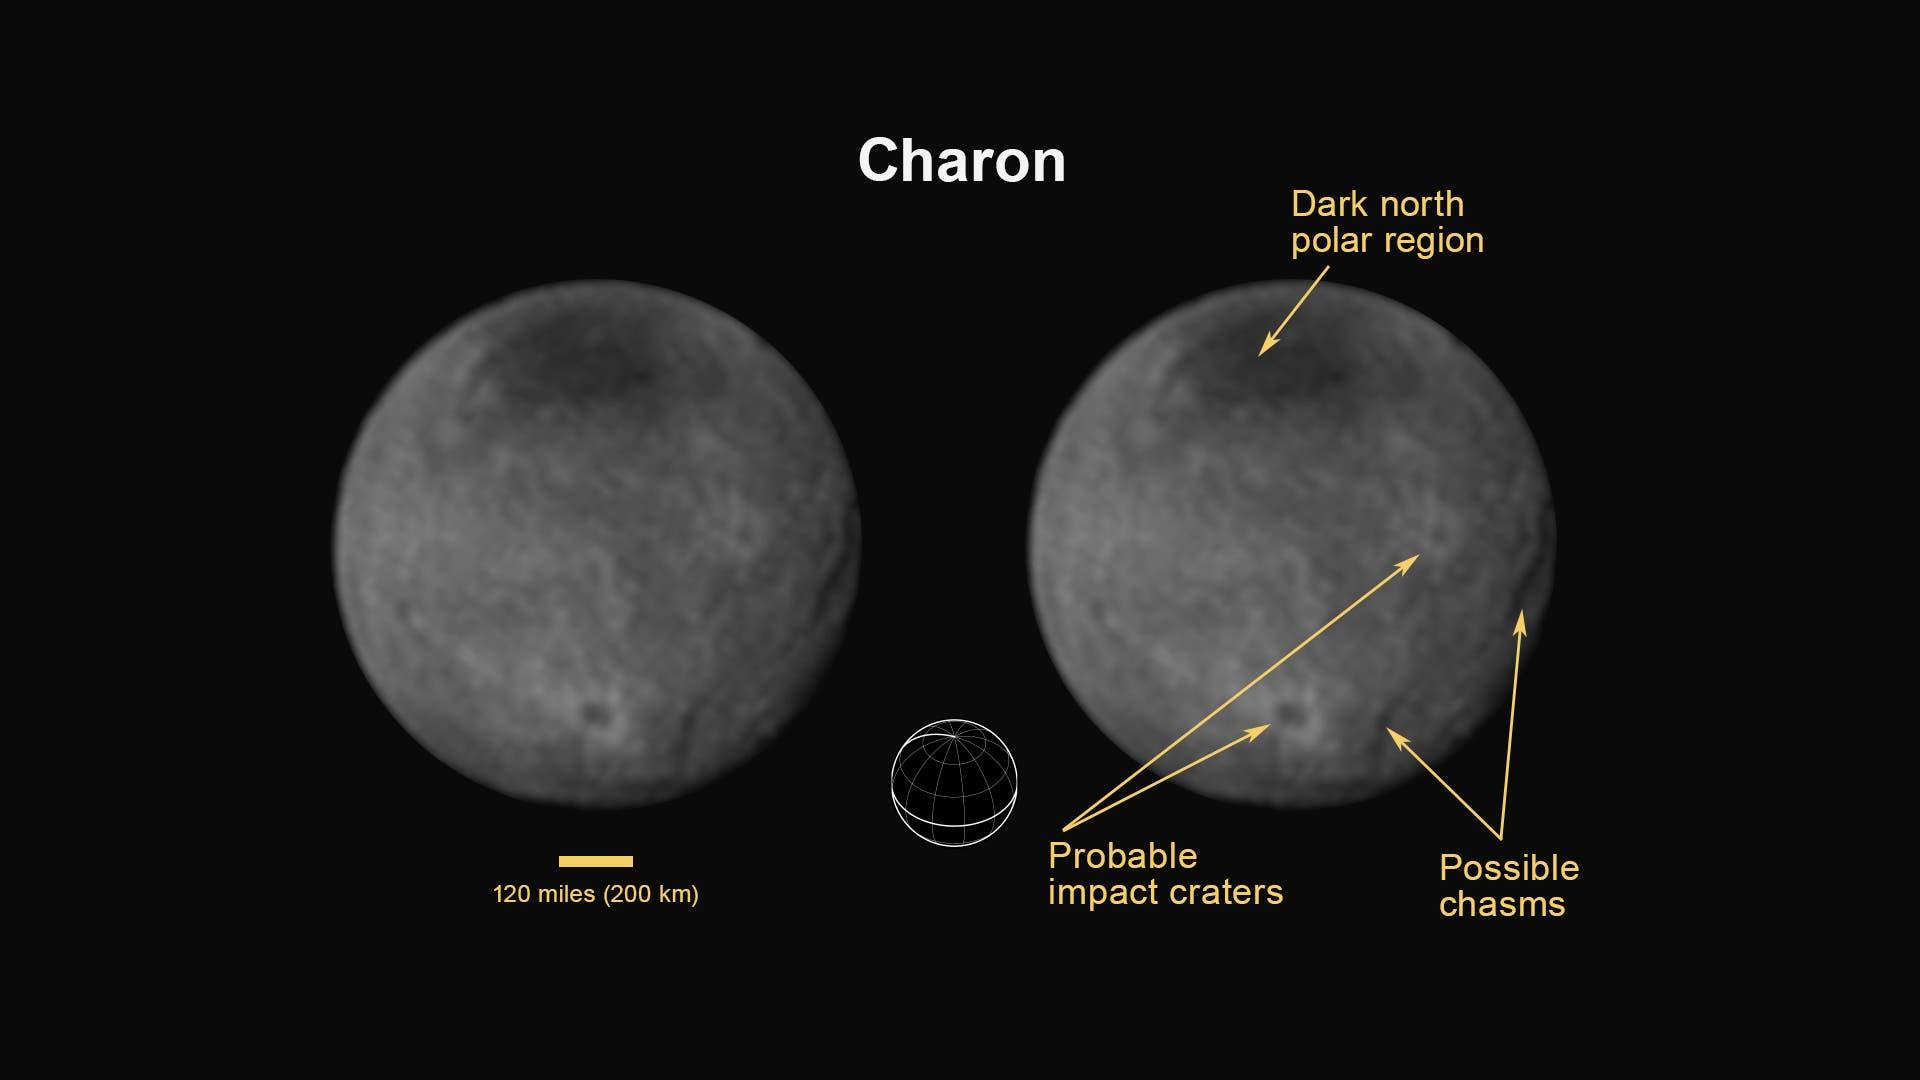 Charon am 11. Juli 2015